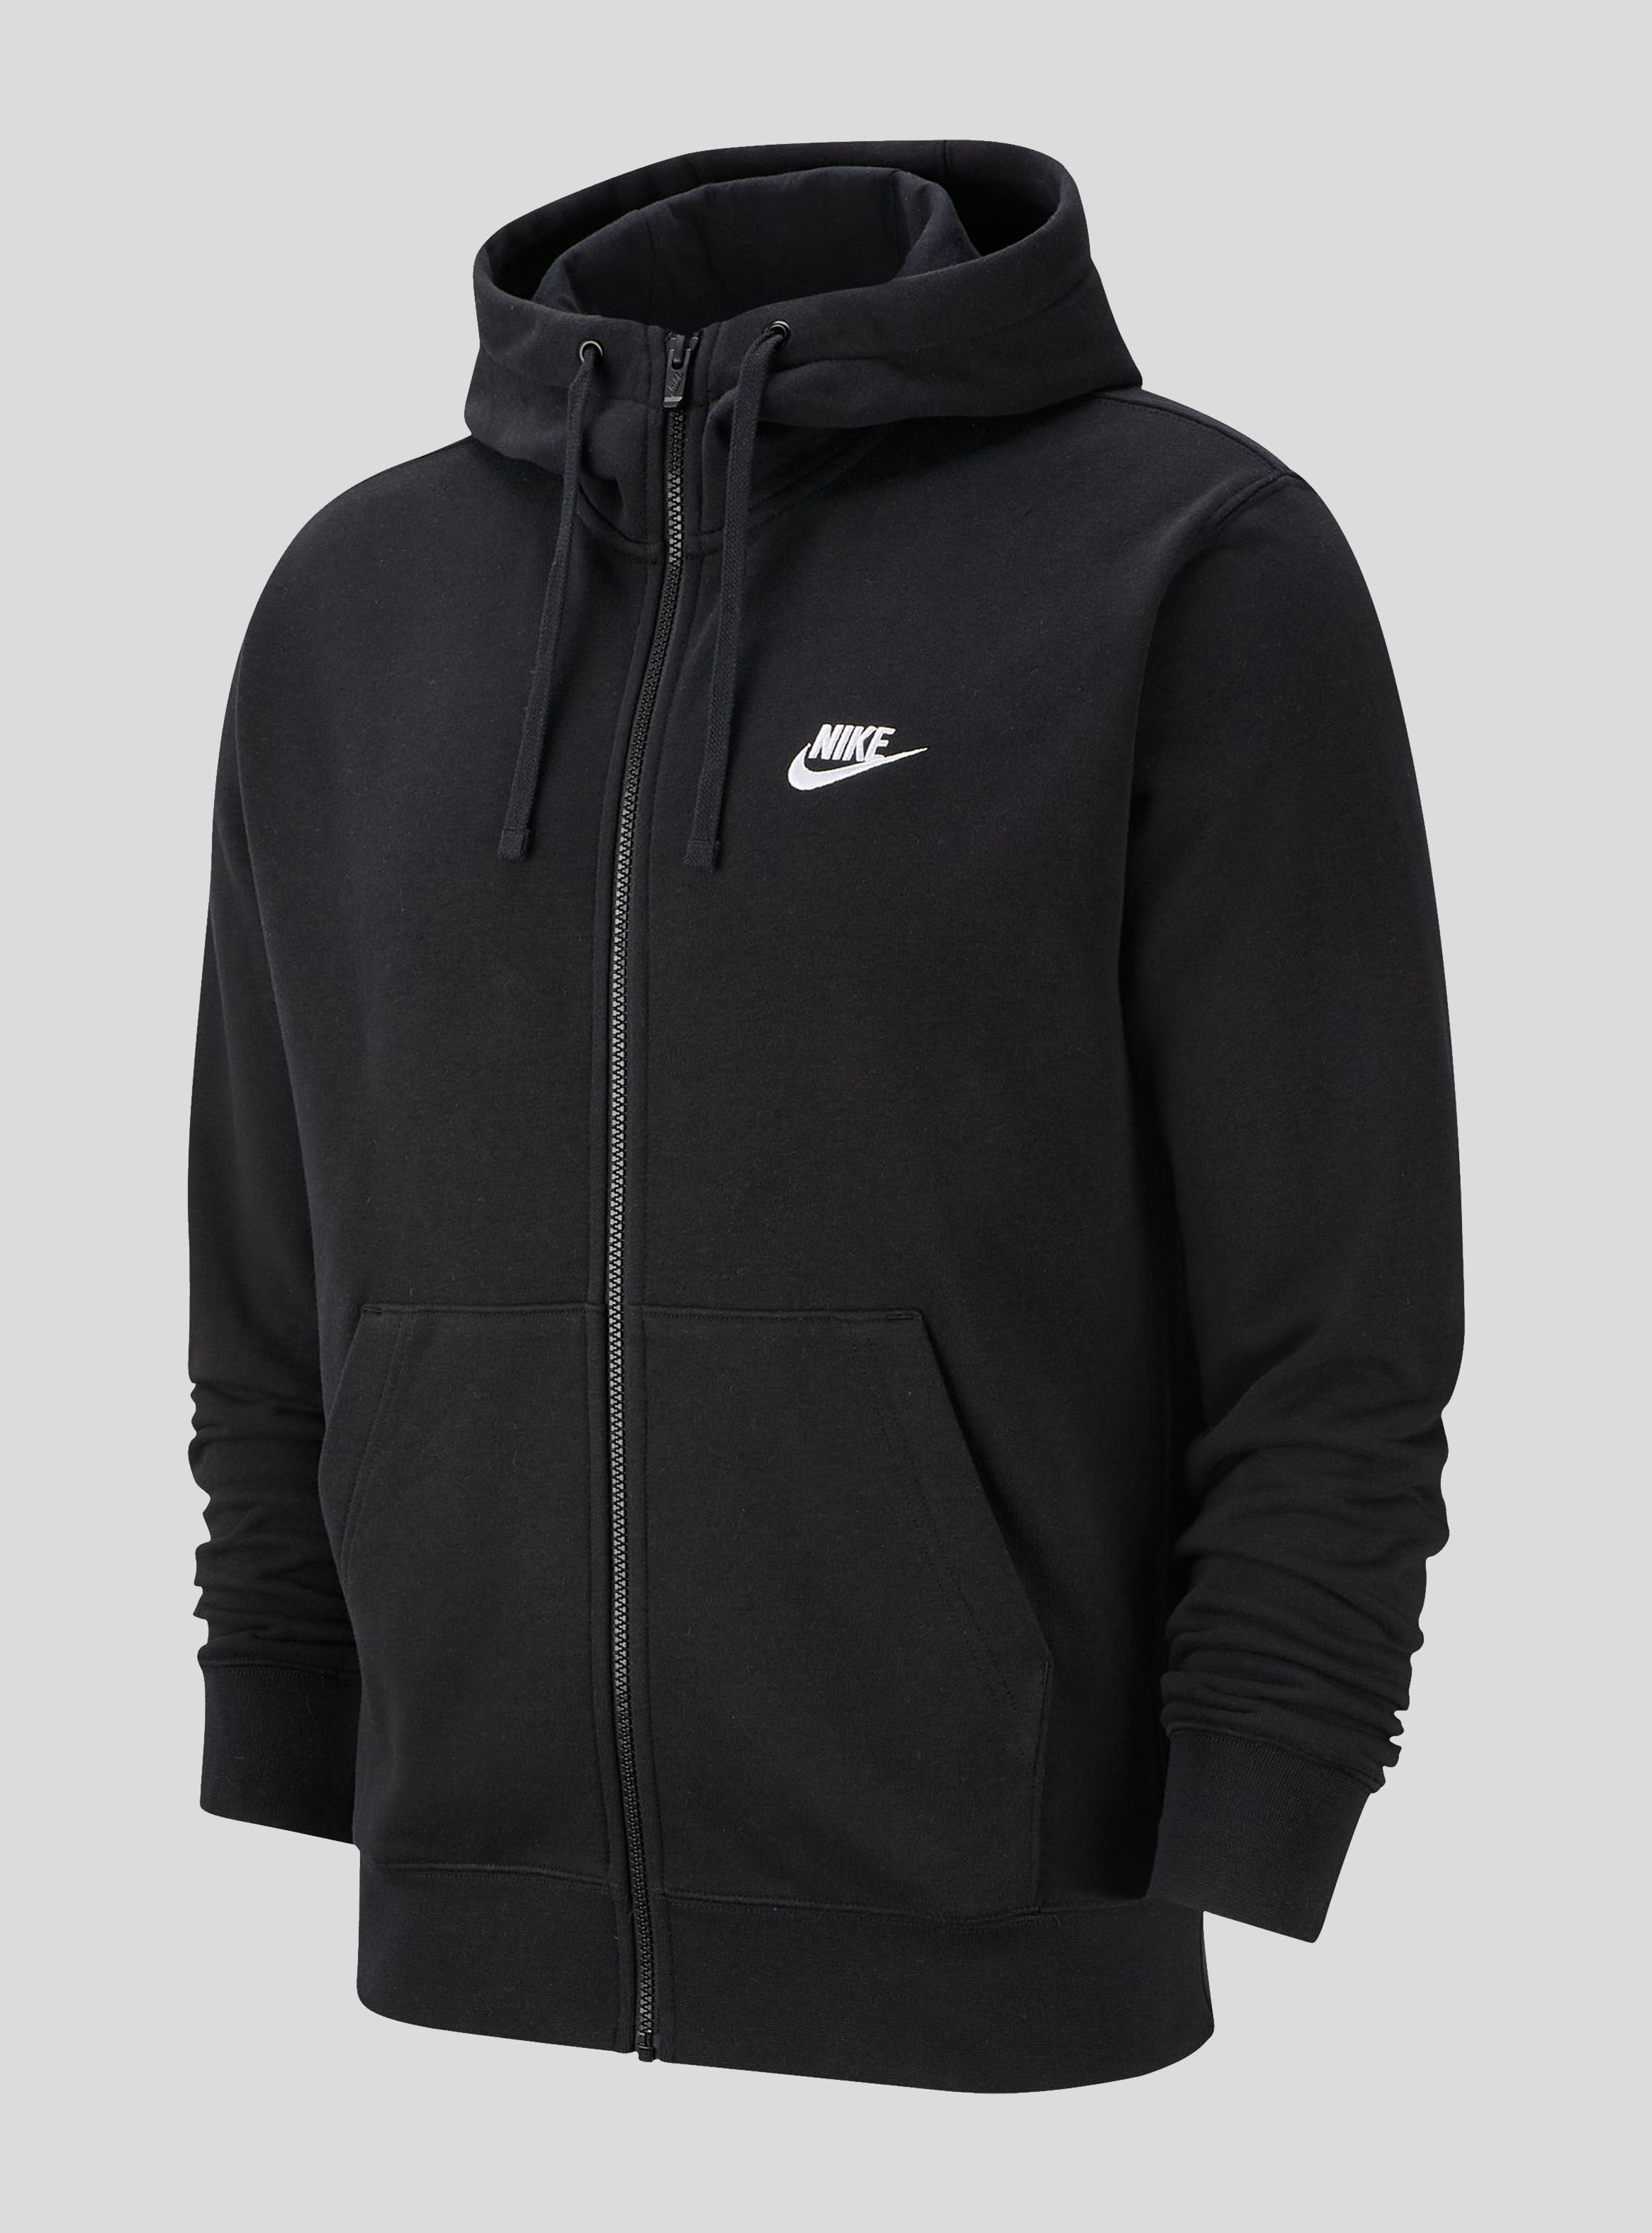 Polerón Nike NSW Club Hoodie FZ FT Negro Hombre